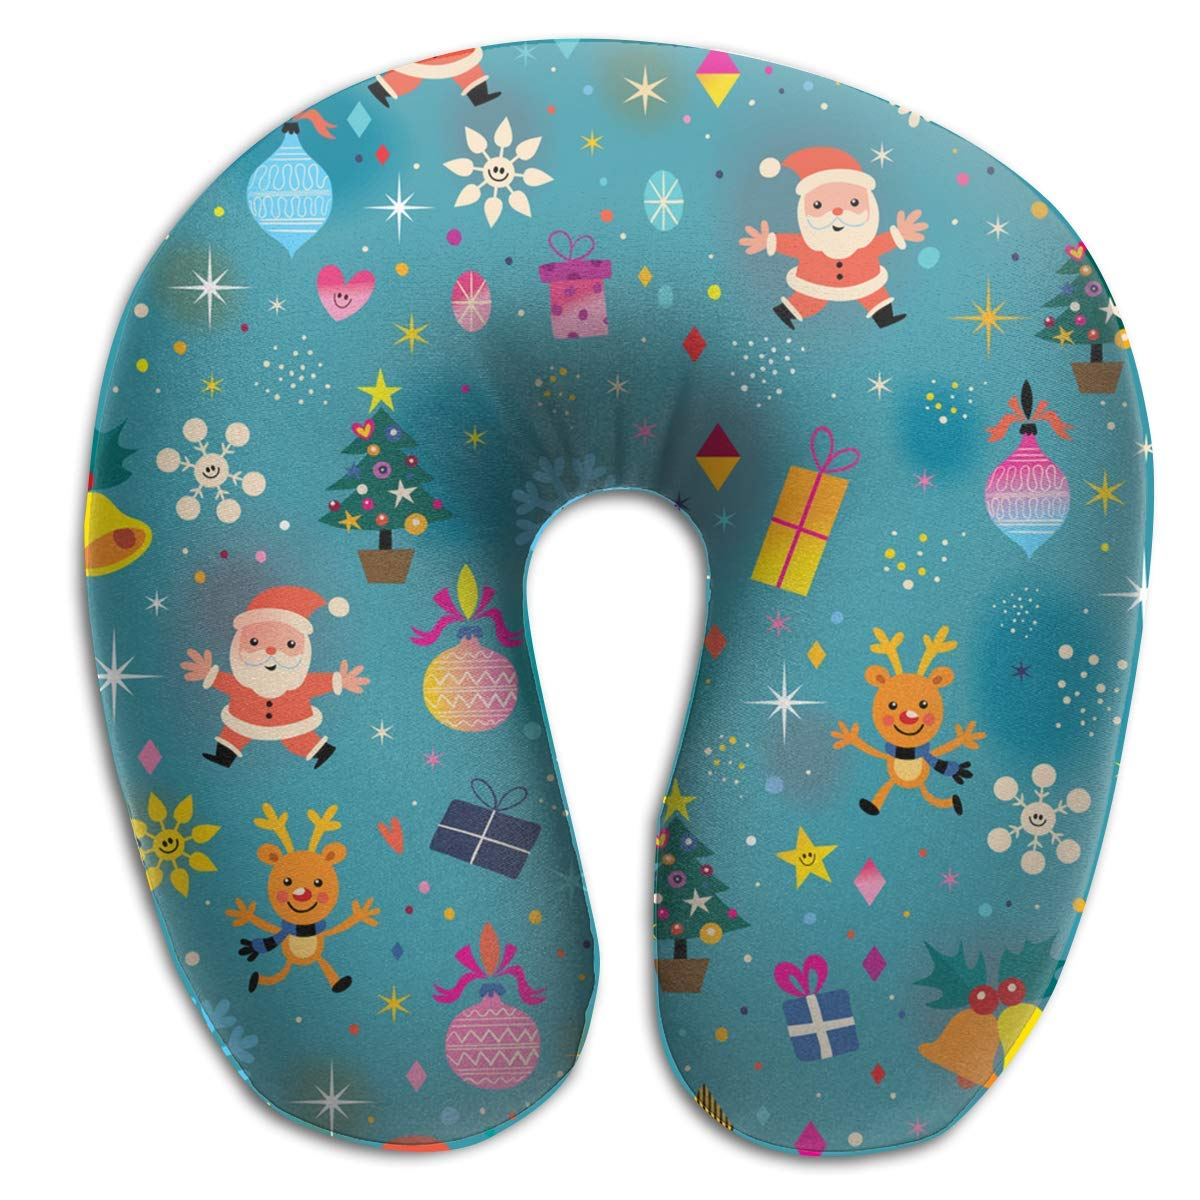 Gxdchfj Memory Foam Neck Pillow Merry Christmas Santa Gift Box U-Shape Travel Pillow Ergonomic Contoured Design Washable Cover for Airplane Train Car Bus Office